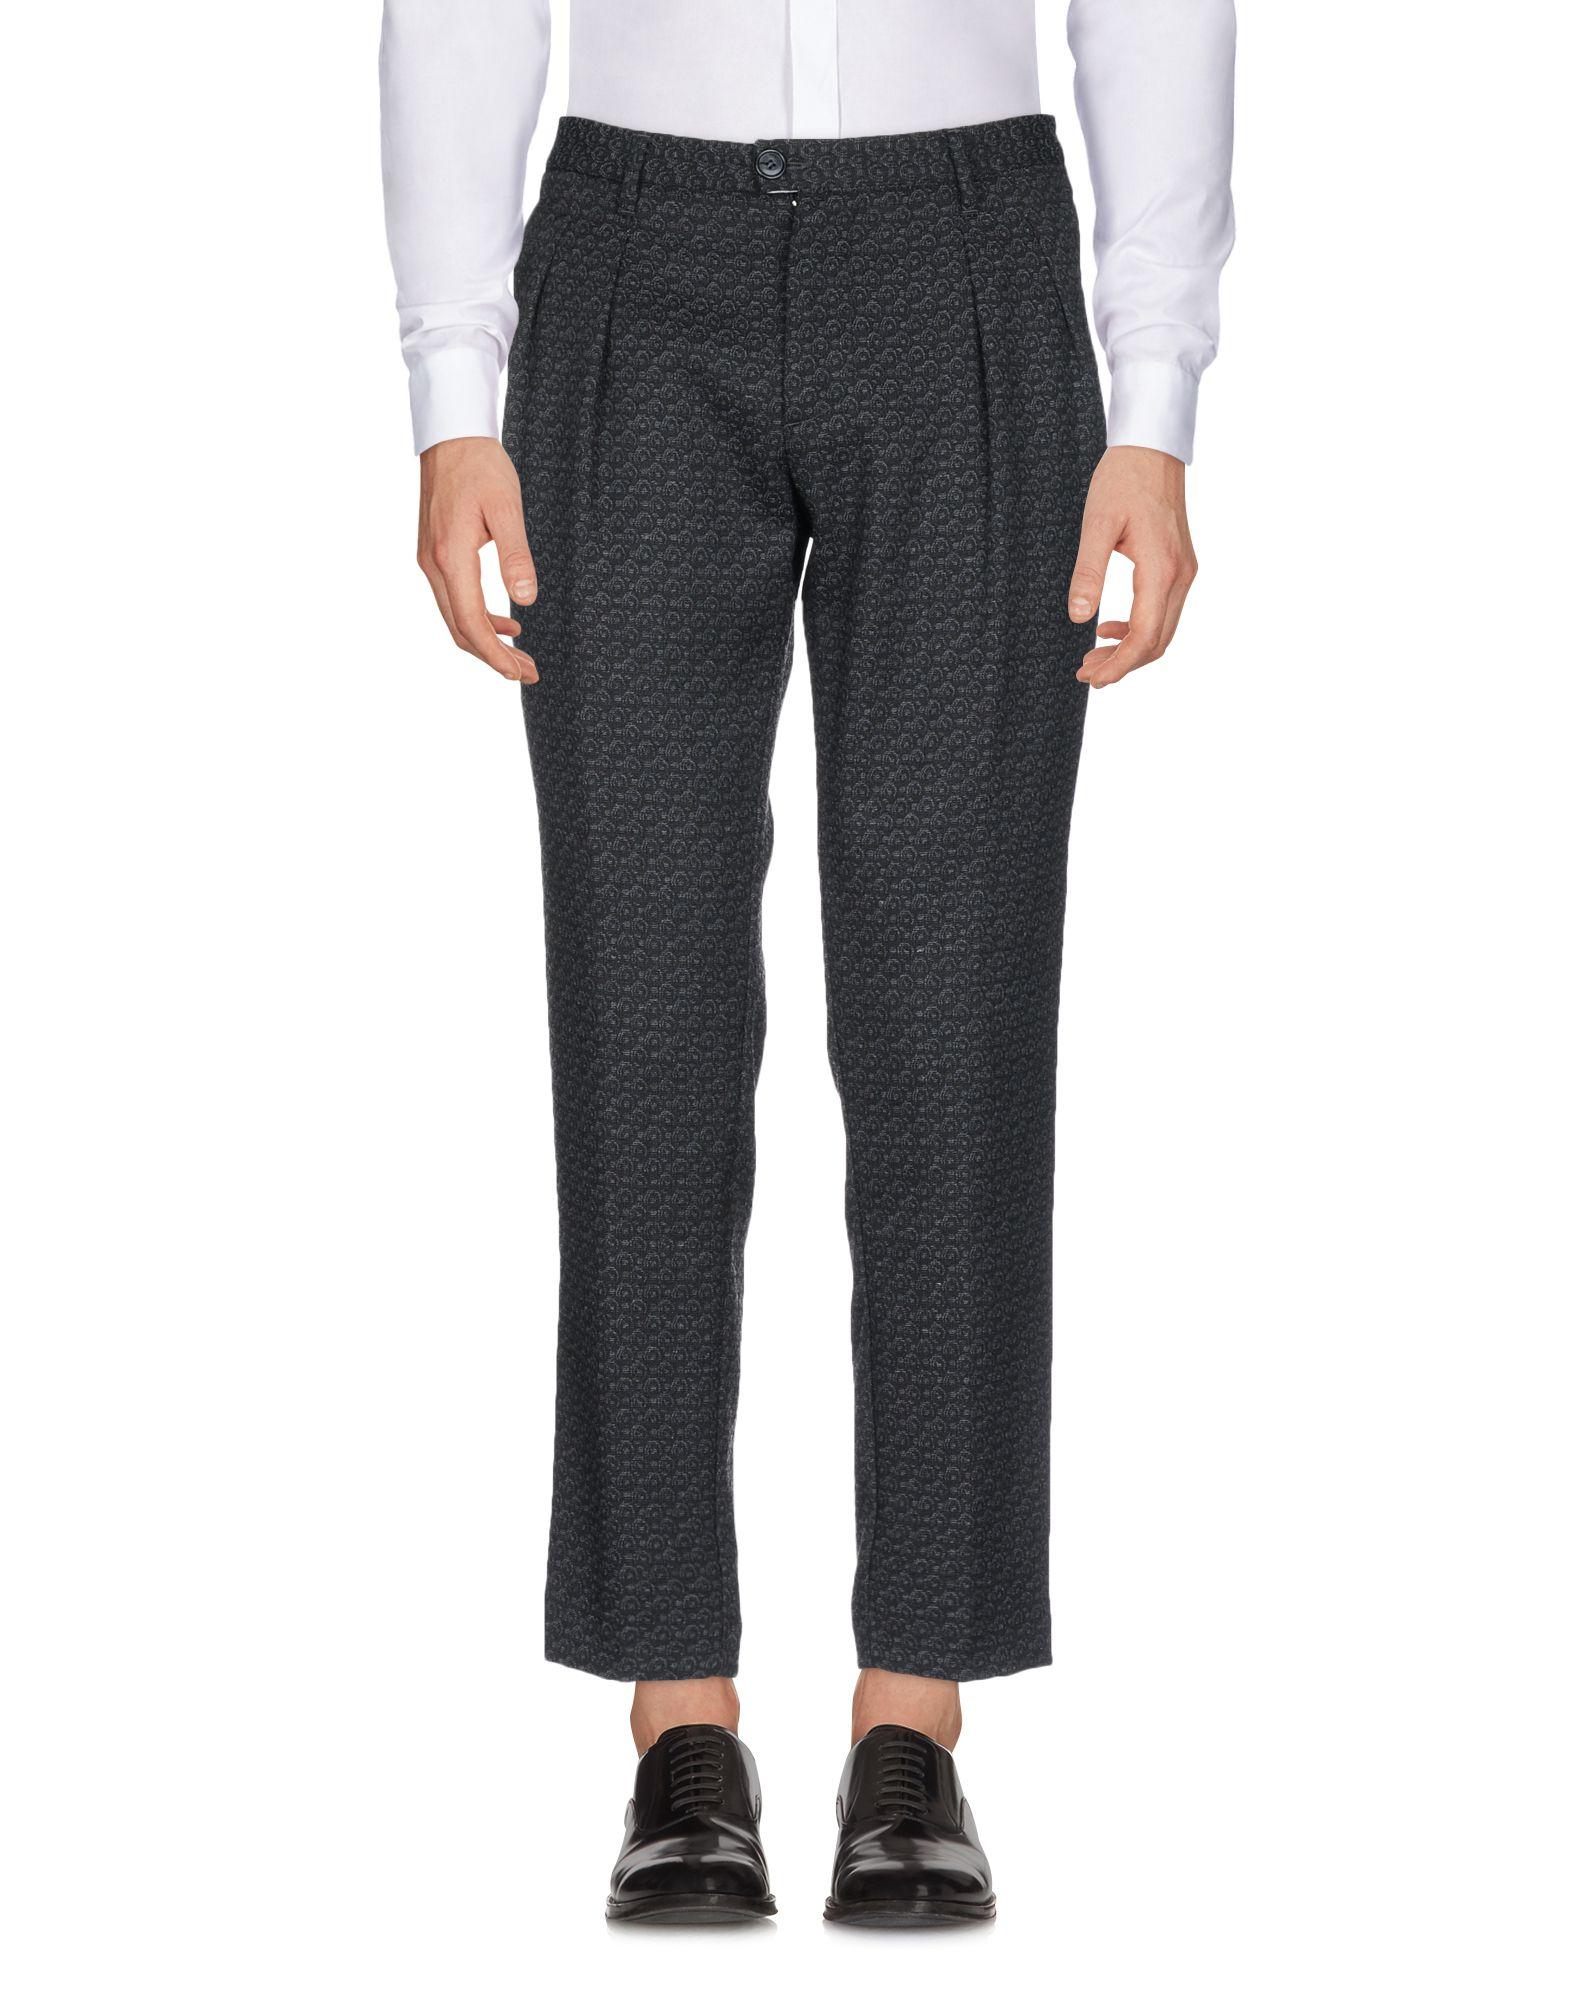 Pantalone Wool 172 Uomo - Acquista online su